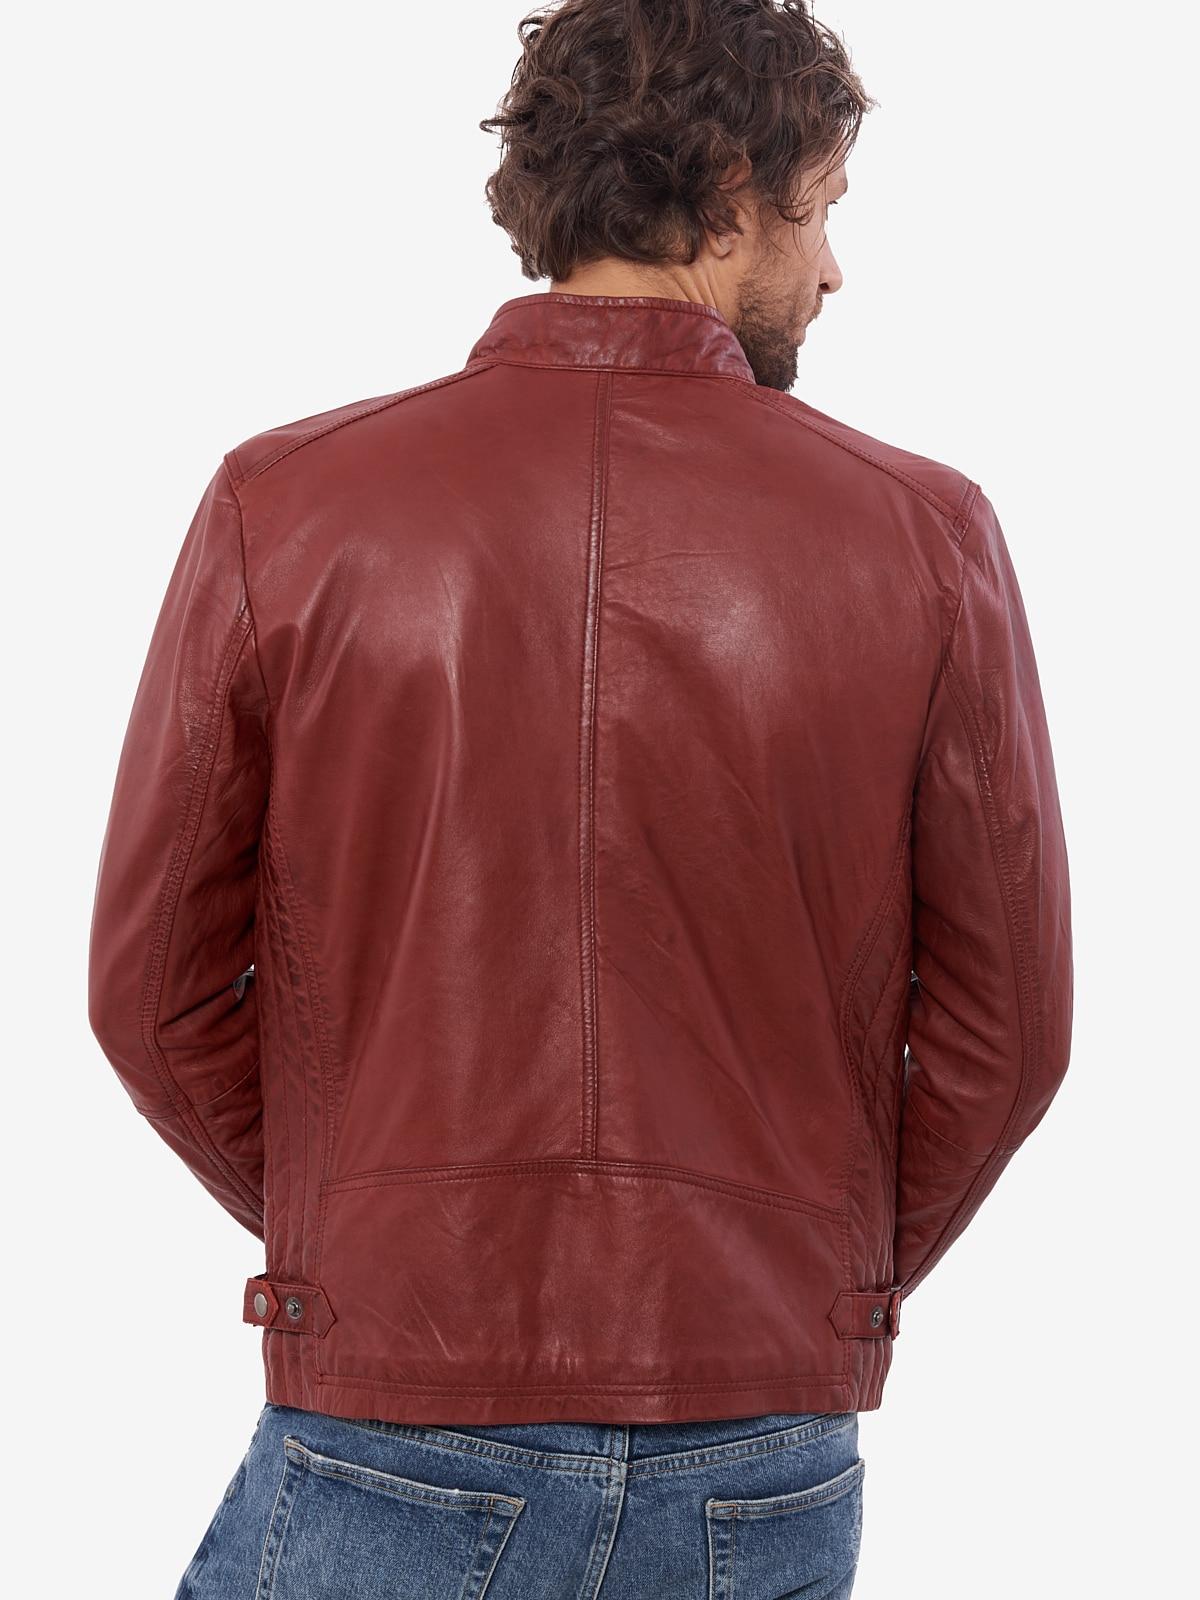 H22468d001b0044478514256ebd1c2710G VAINAS European Brand Mens Genuine Leather jacket for men Winter Real sheep leather jacket Motorcycle jackets Biker jackets Alfa